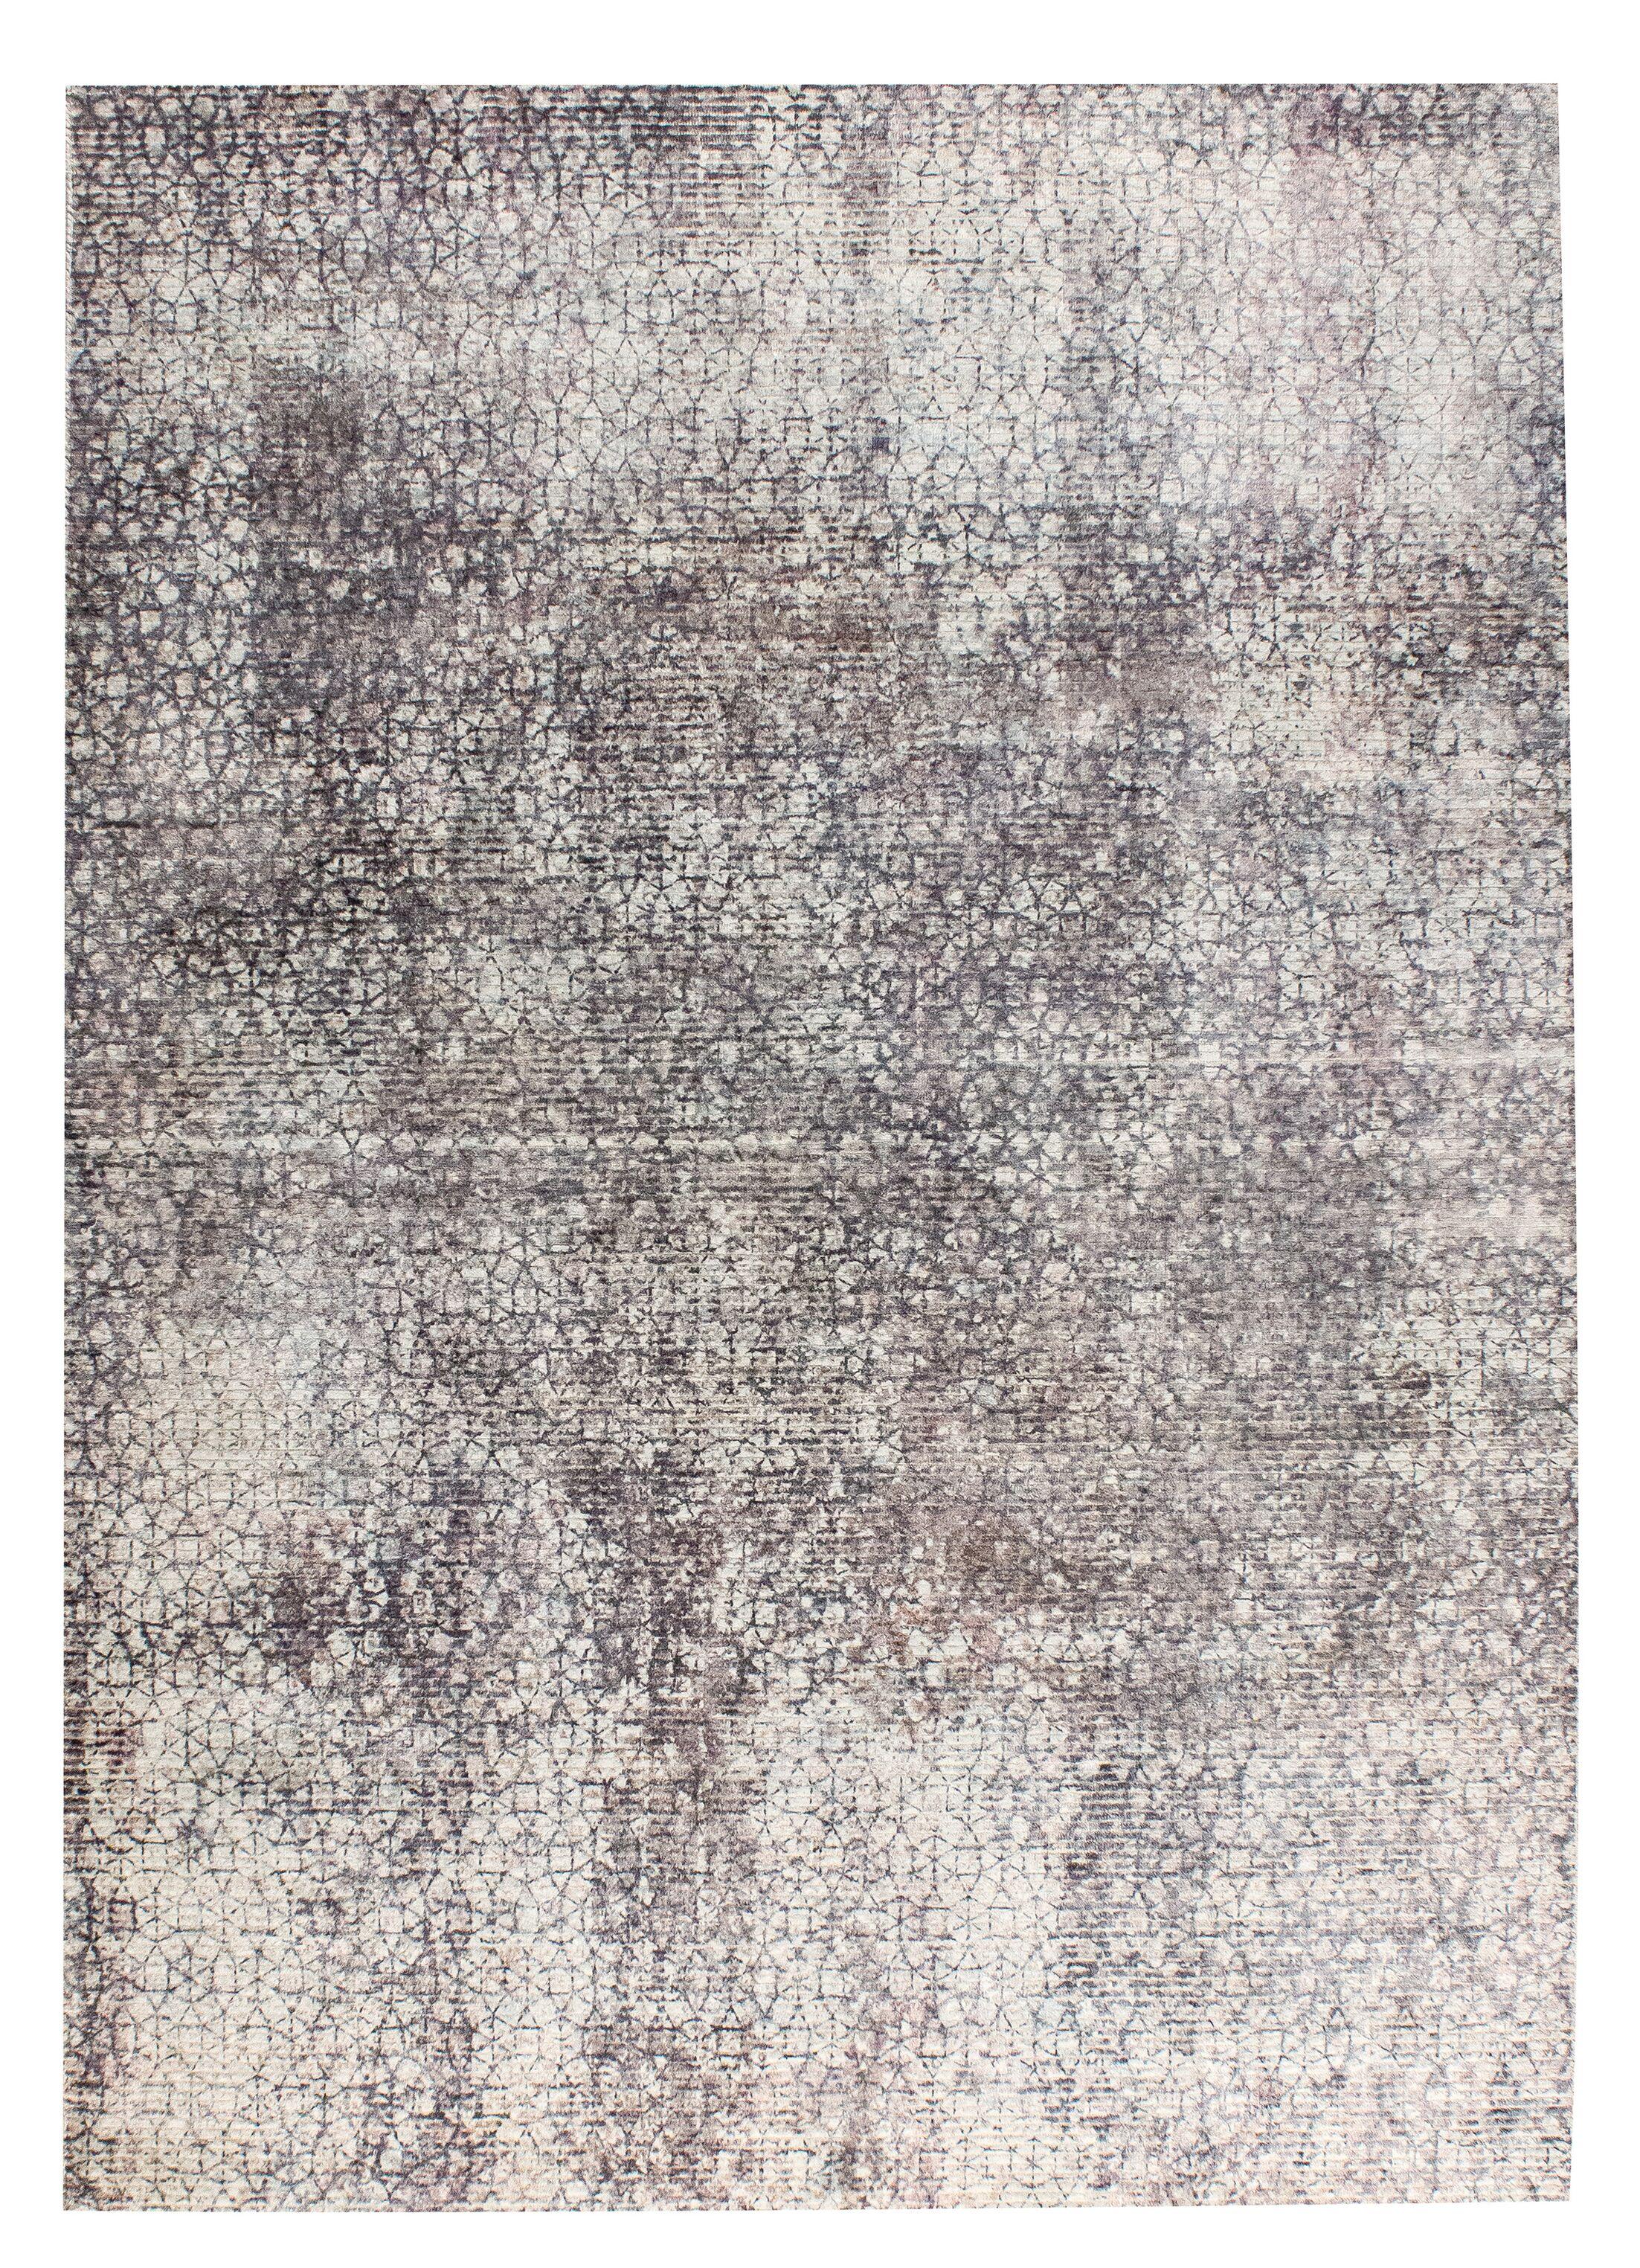 Monza Hand-Woven Gray/Beige Area Rug Rug Size: 8' x 10'